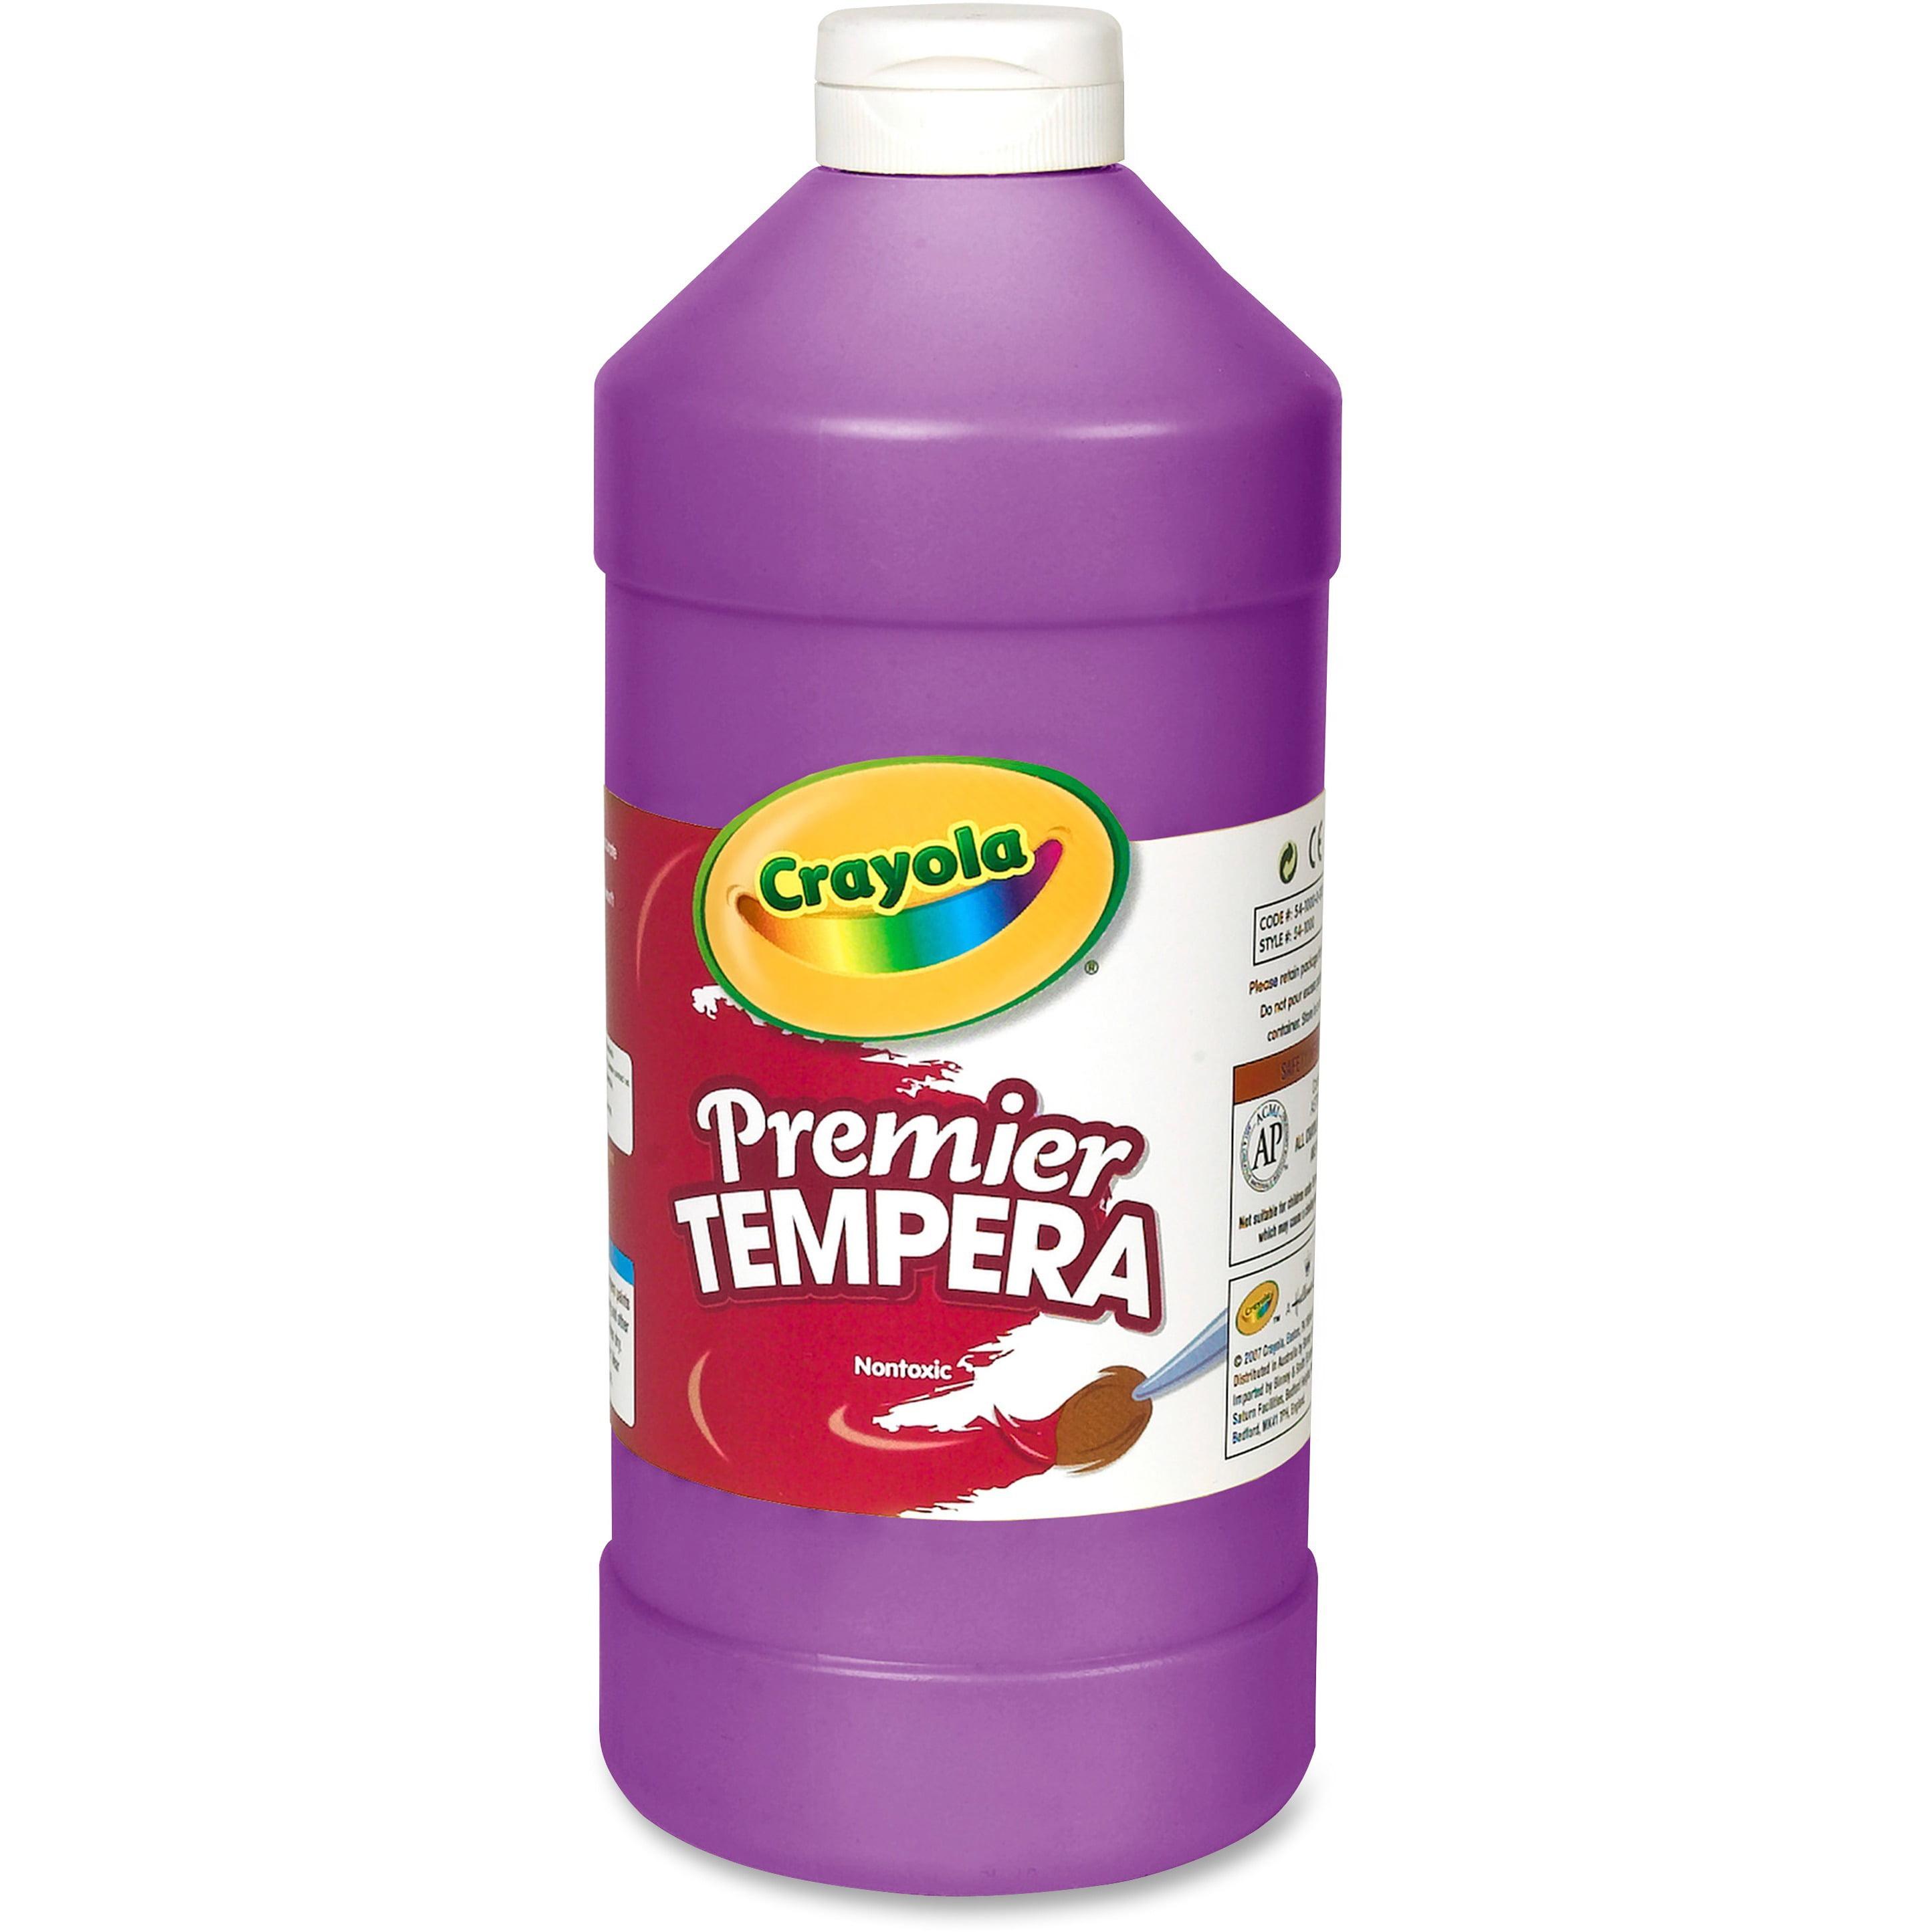 Crayola 32 Oz Premier Tempera Paint, 1 Each